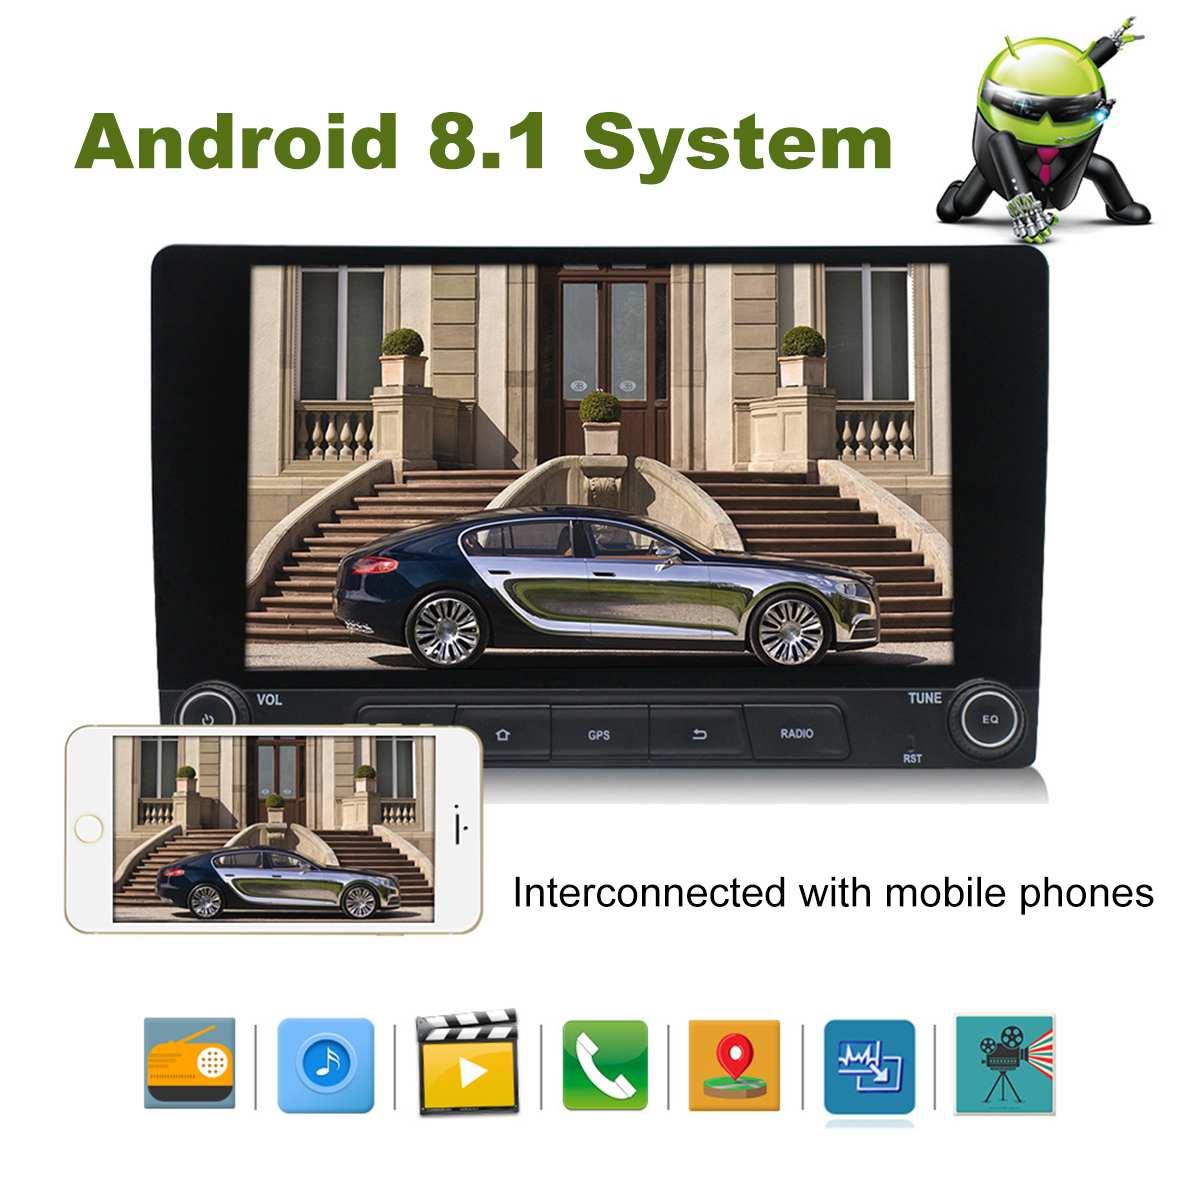 12V 10,1 дюймов gps-навигатор для машины навигация Автомобильные навигаторы android bluetooth AV-IN FM MP3/mp4 плееры